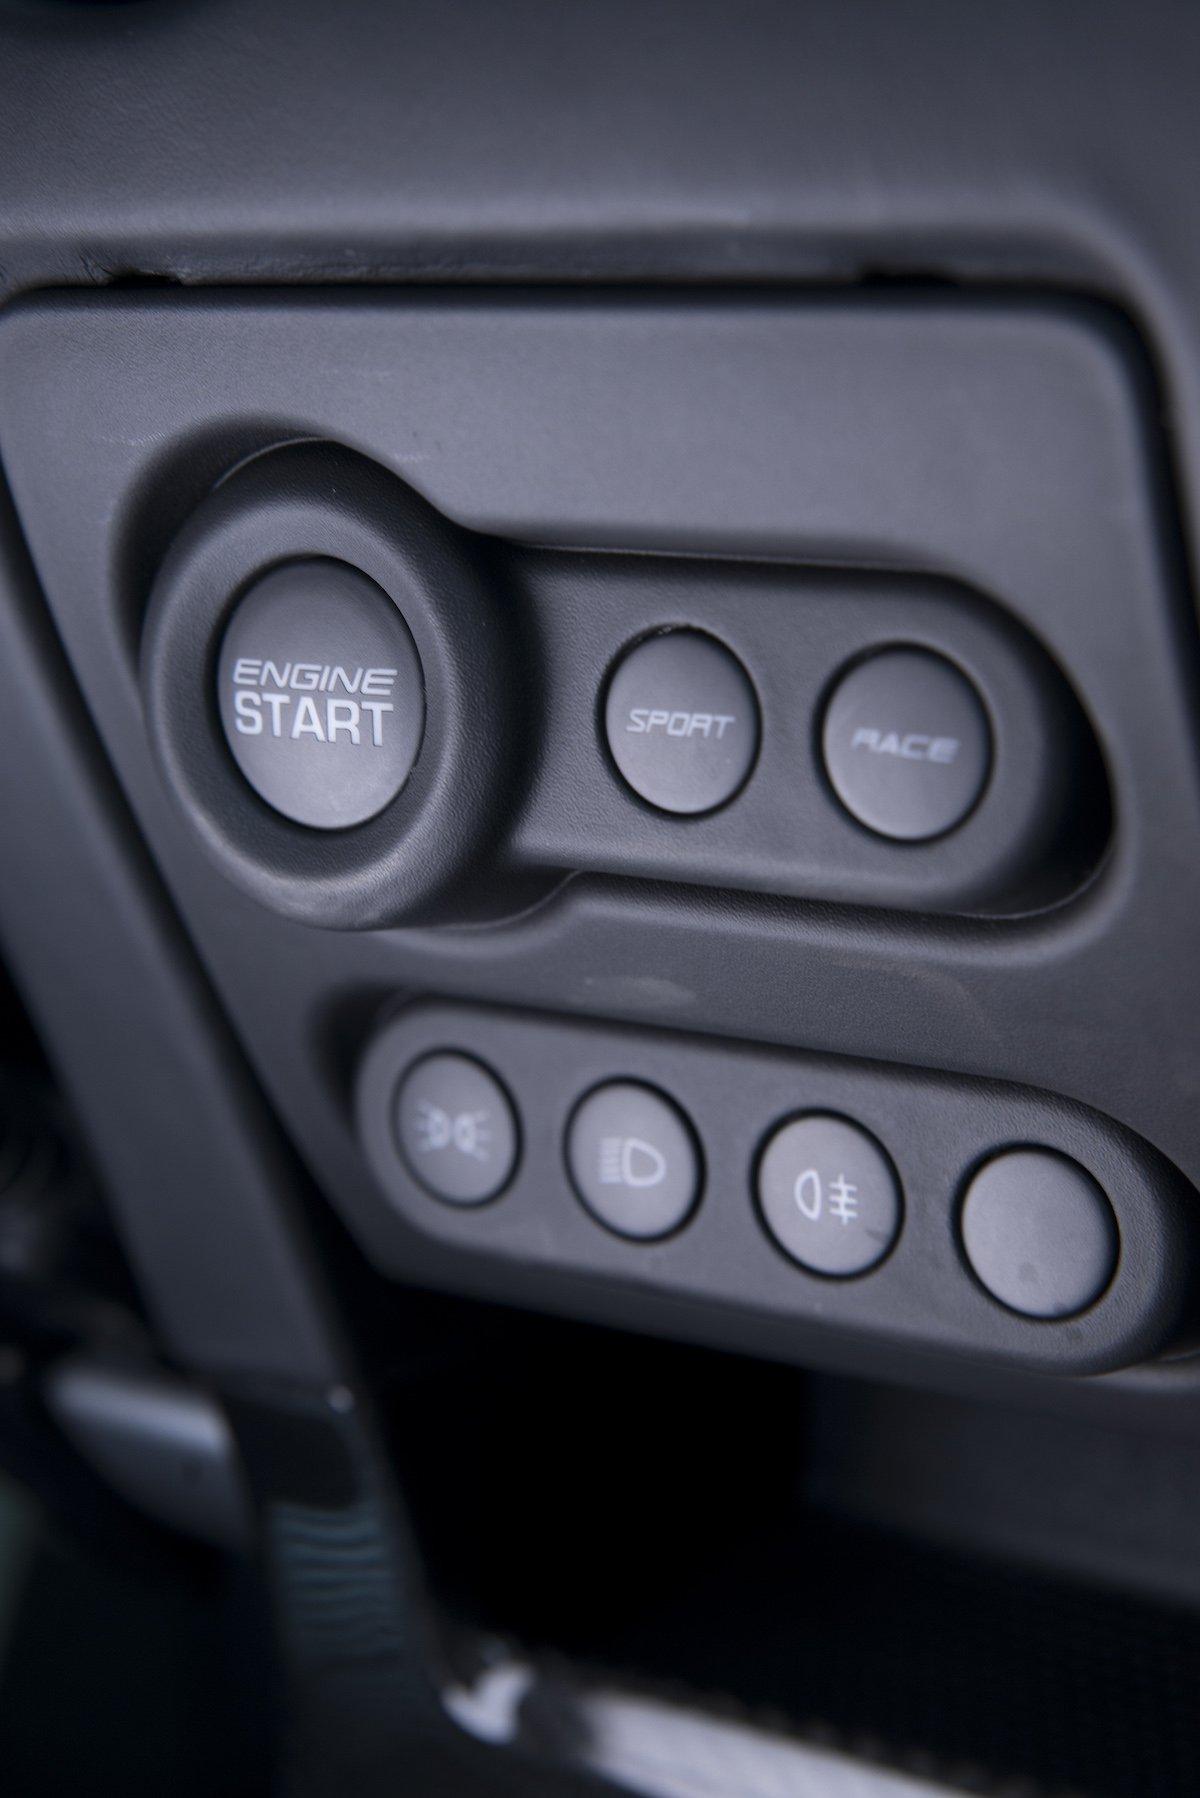 Lotus Exige Sport 380 Rennstrecke Racetrack Test Review Fahrbericht blau Sportwagen V6 Kompressor Drive Mode Fahrmodus Einstellung Setup